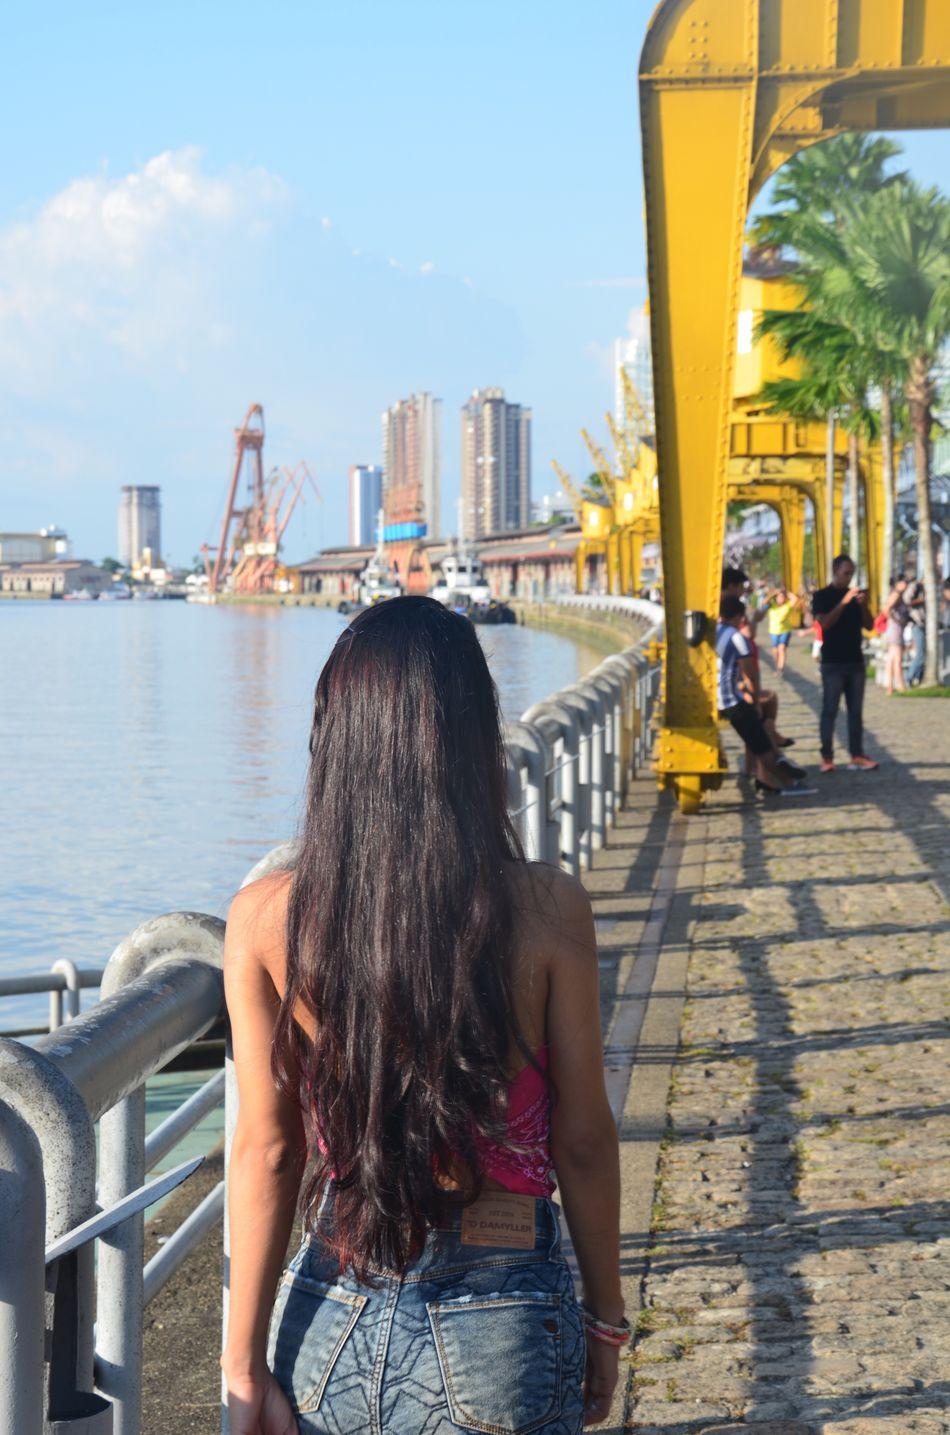 City Architecture Real People Lifestyles Amazonia Brazil